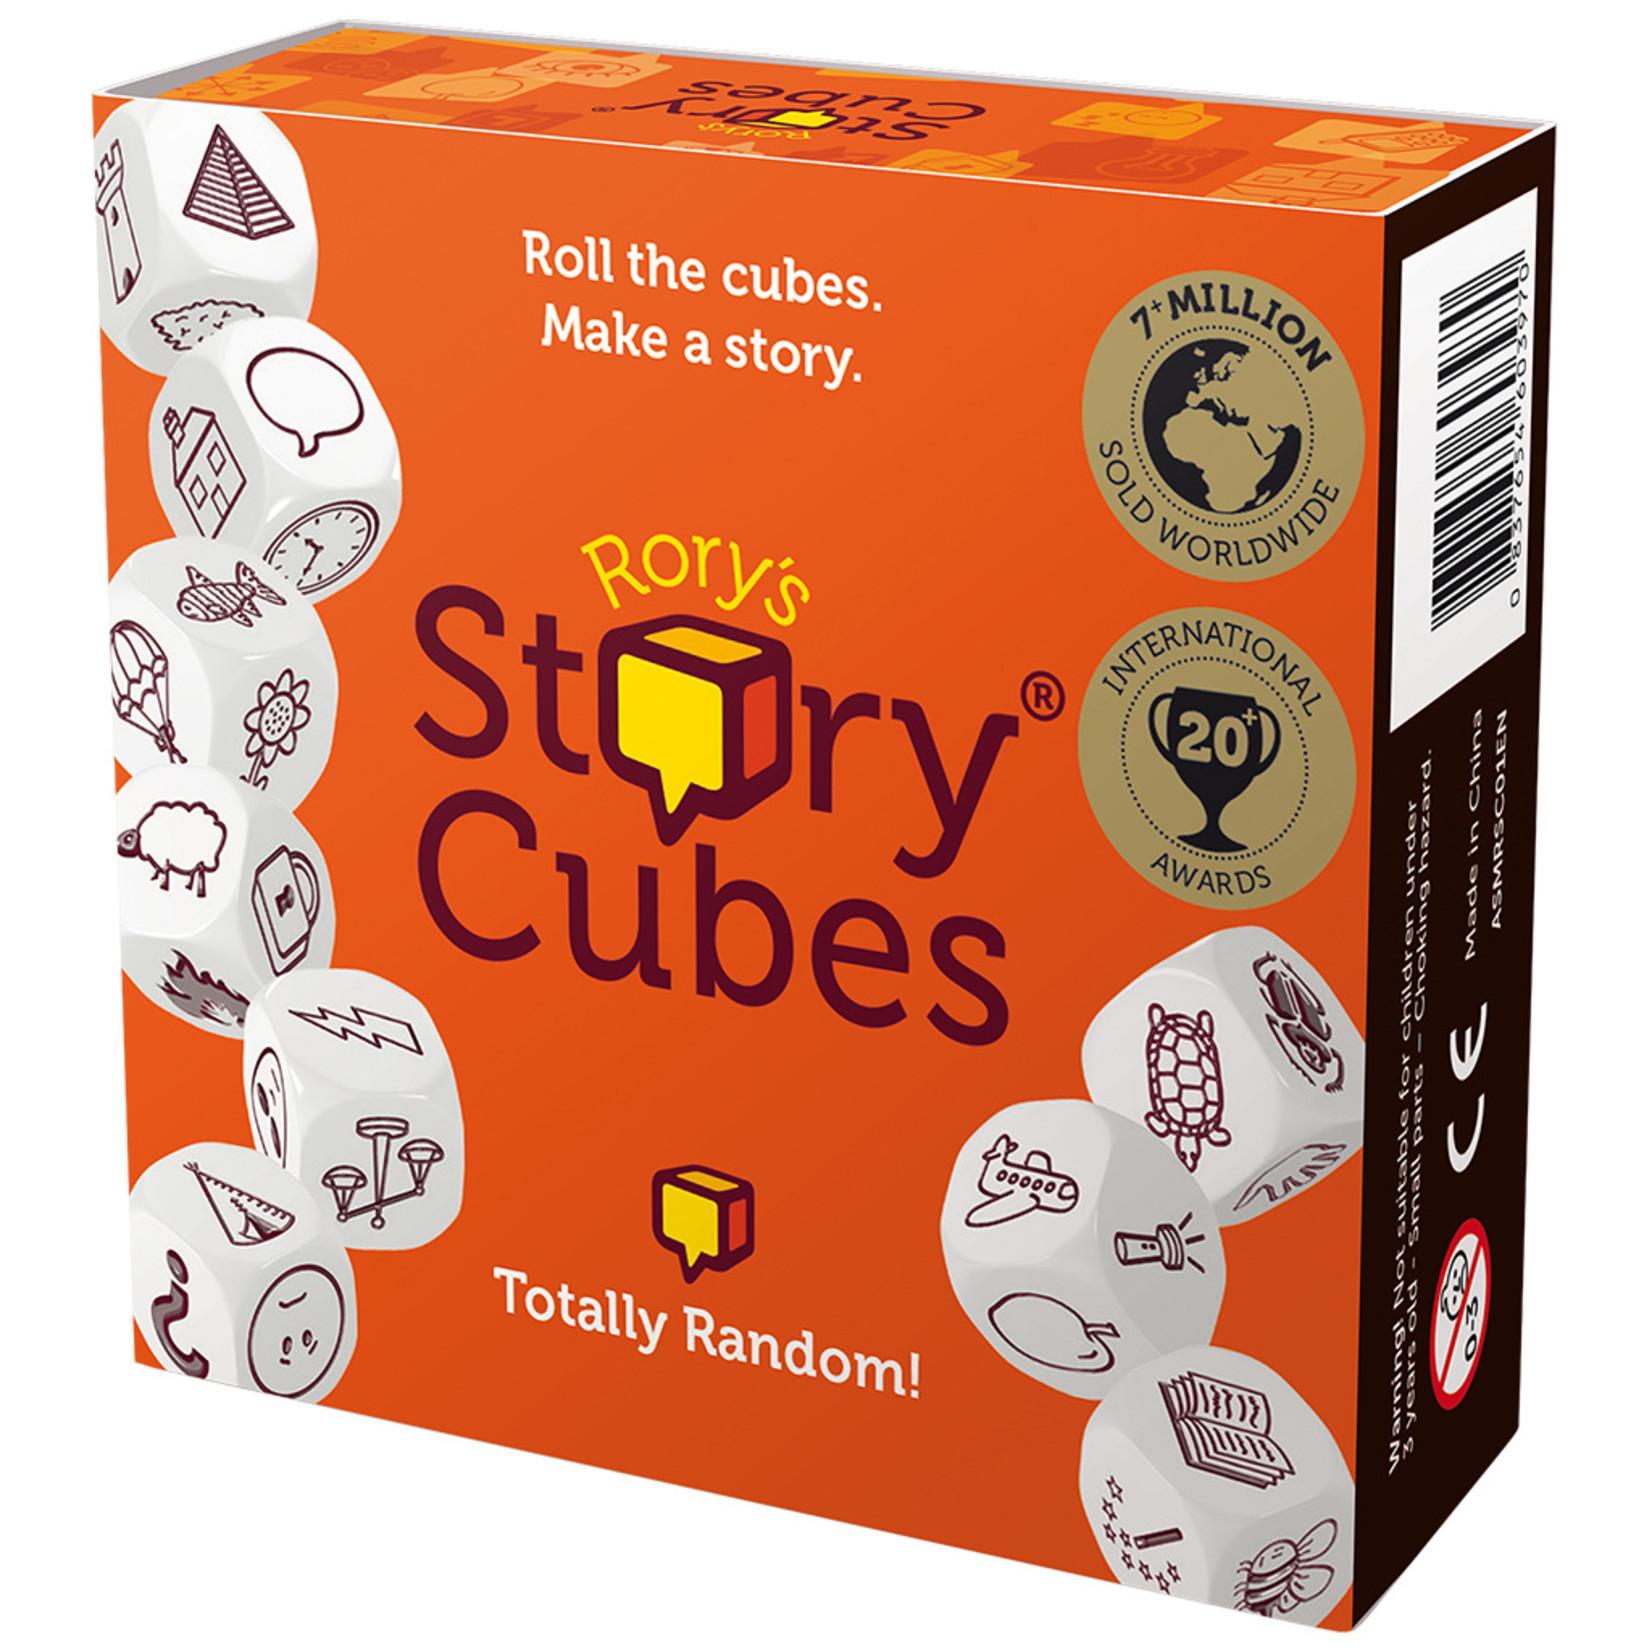 Rory's Story Cube